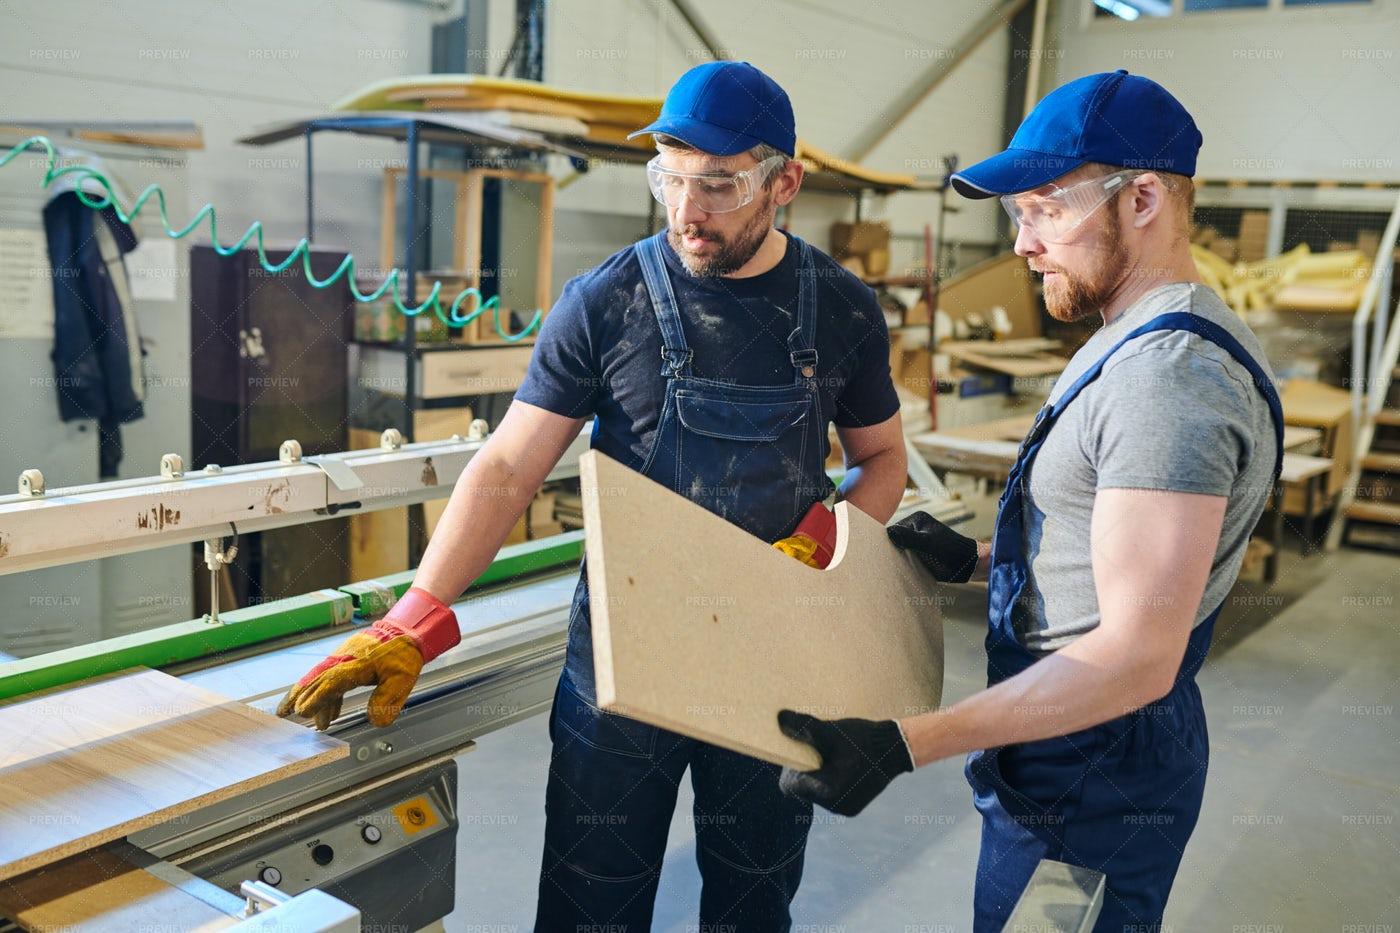 Furniture Engineers At Work: Stock Photos